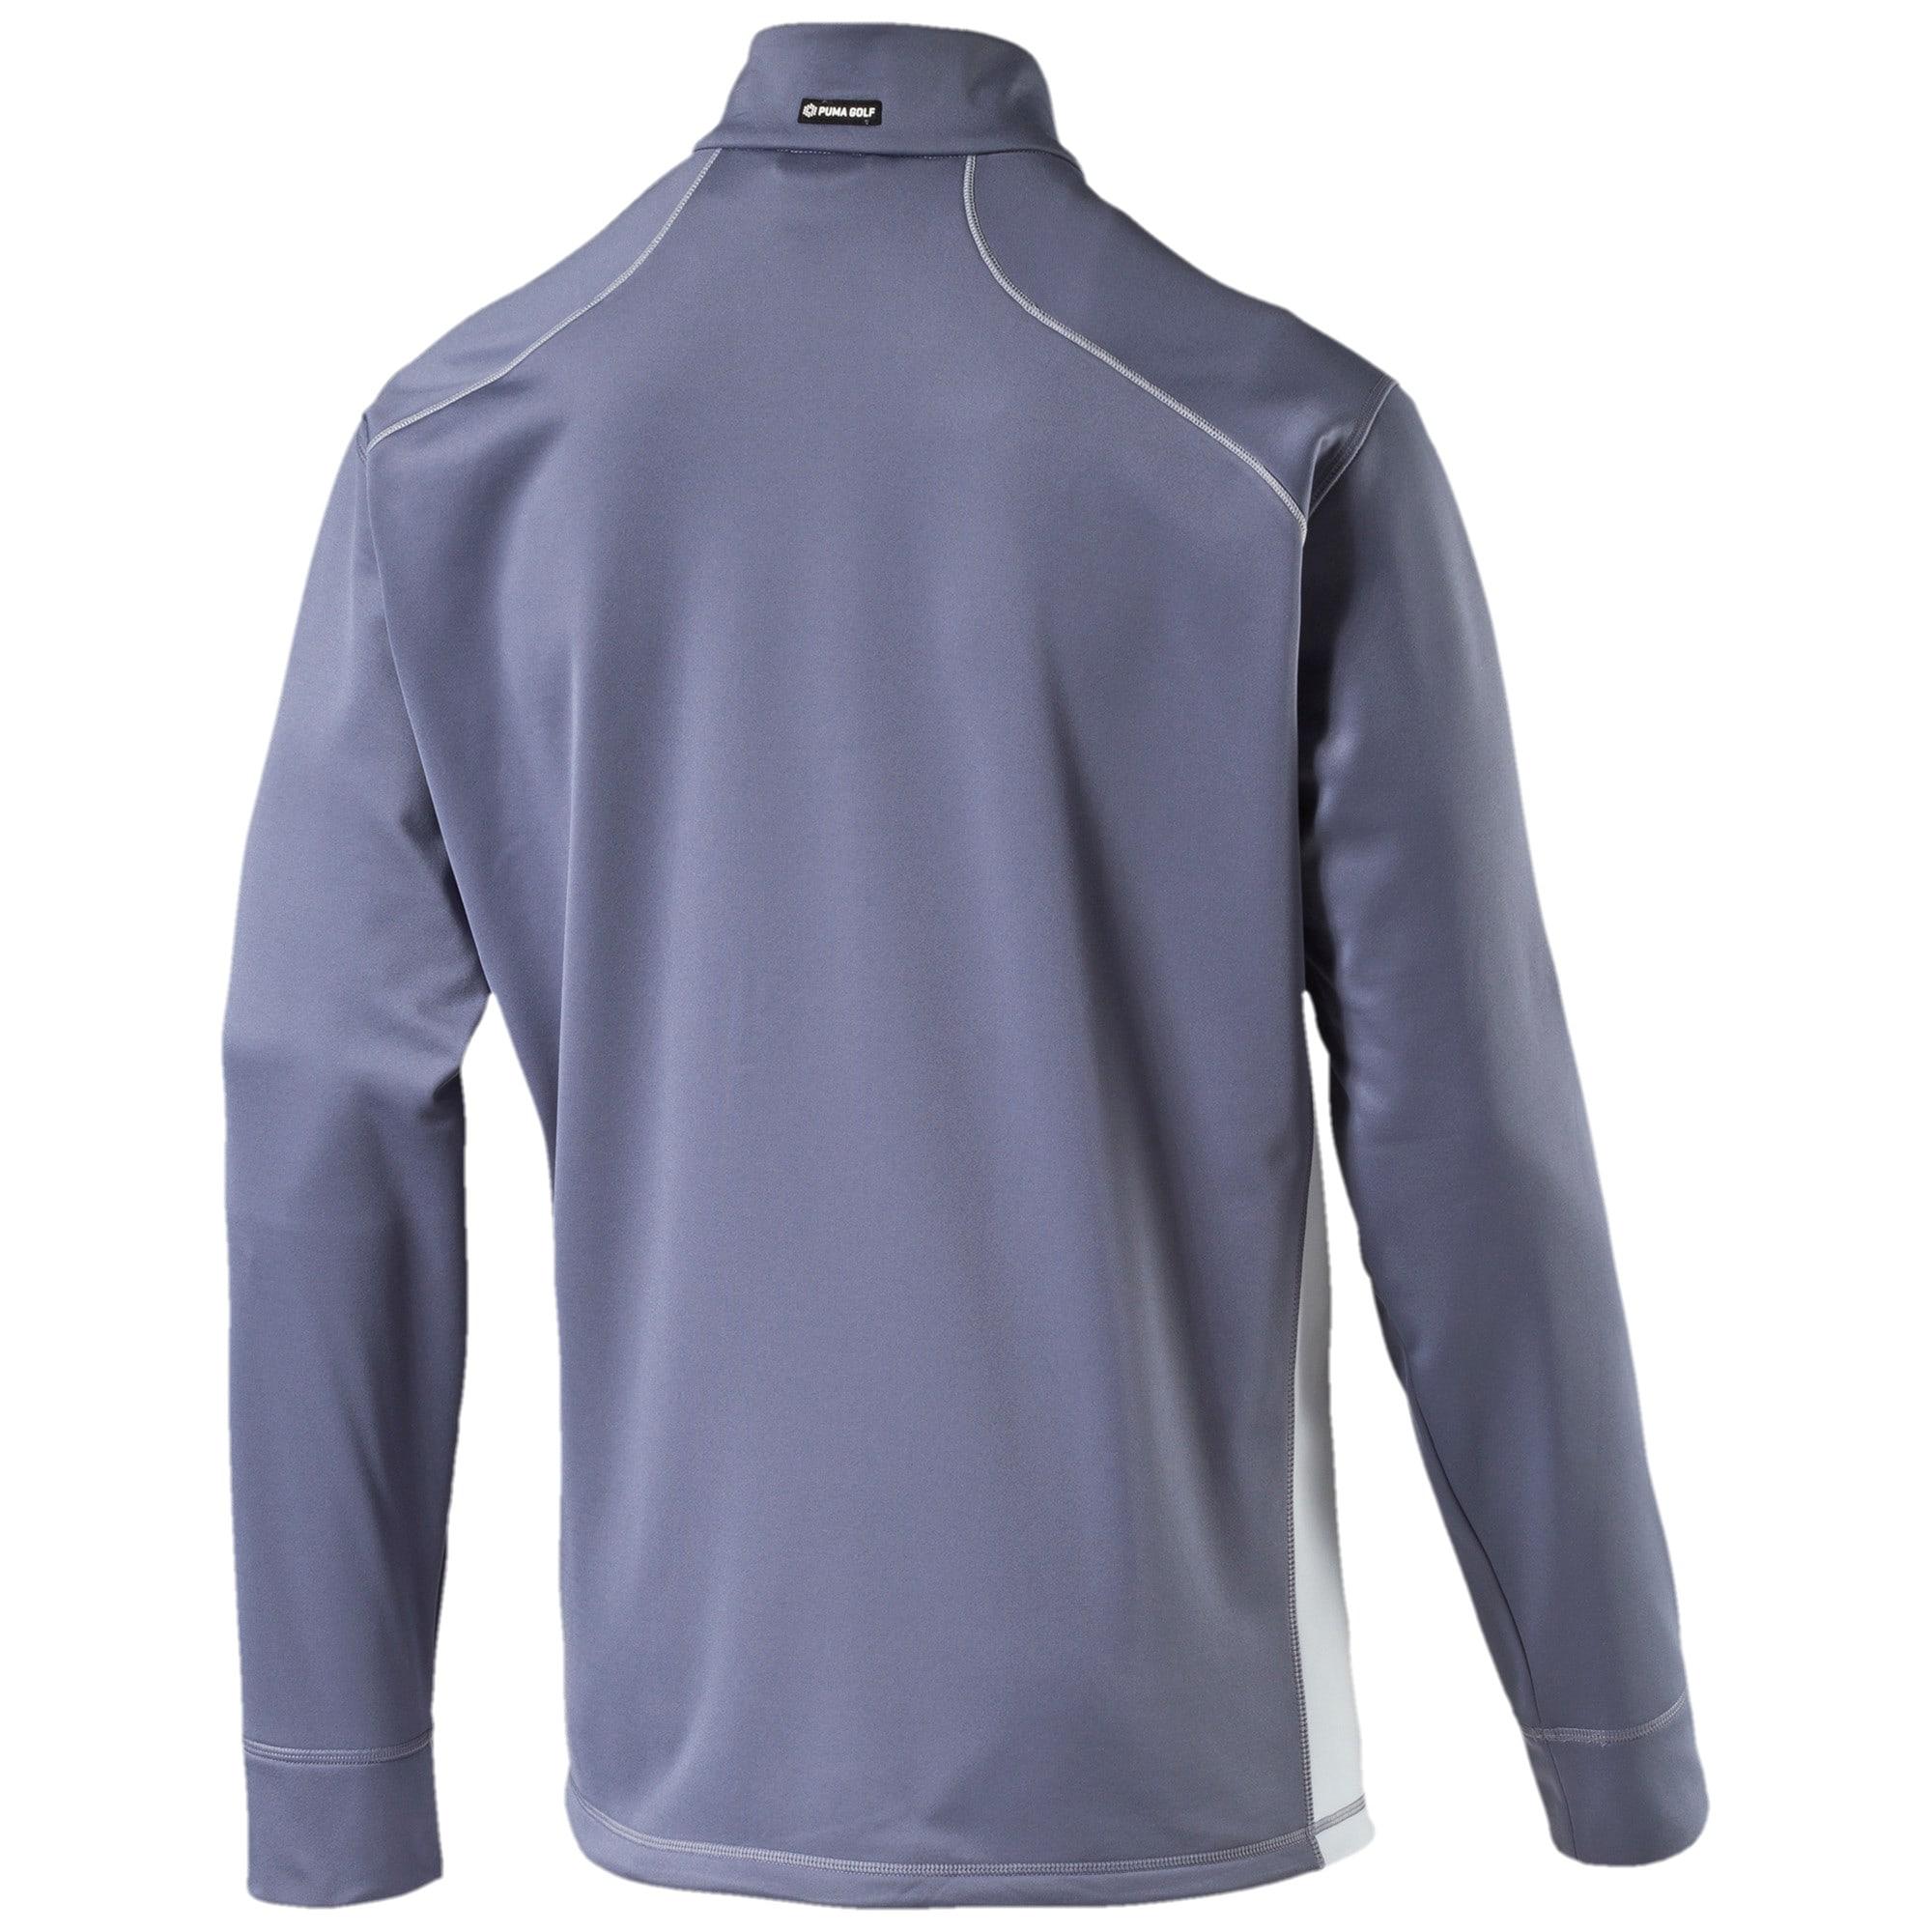 Thumbnail 2 of Golf Essential Sweater, folkstone gray-gray dawn, medium-IND